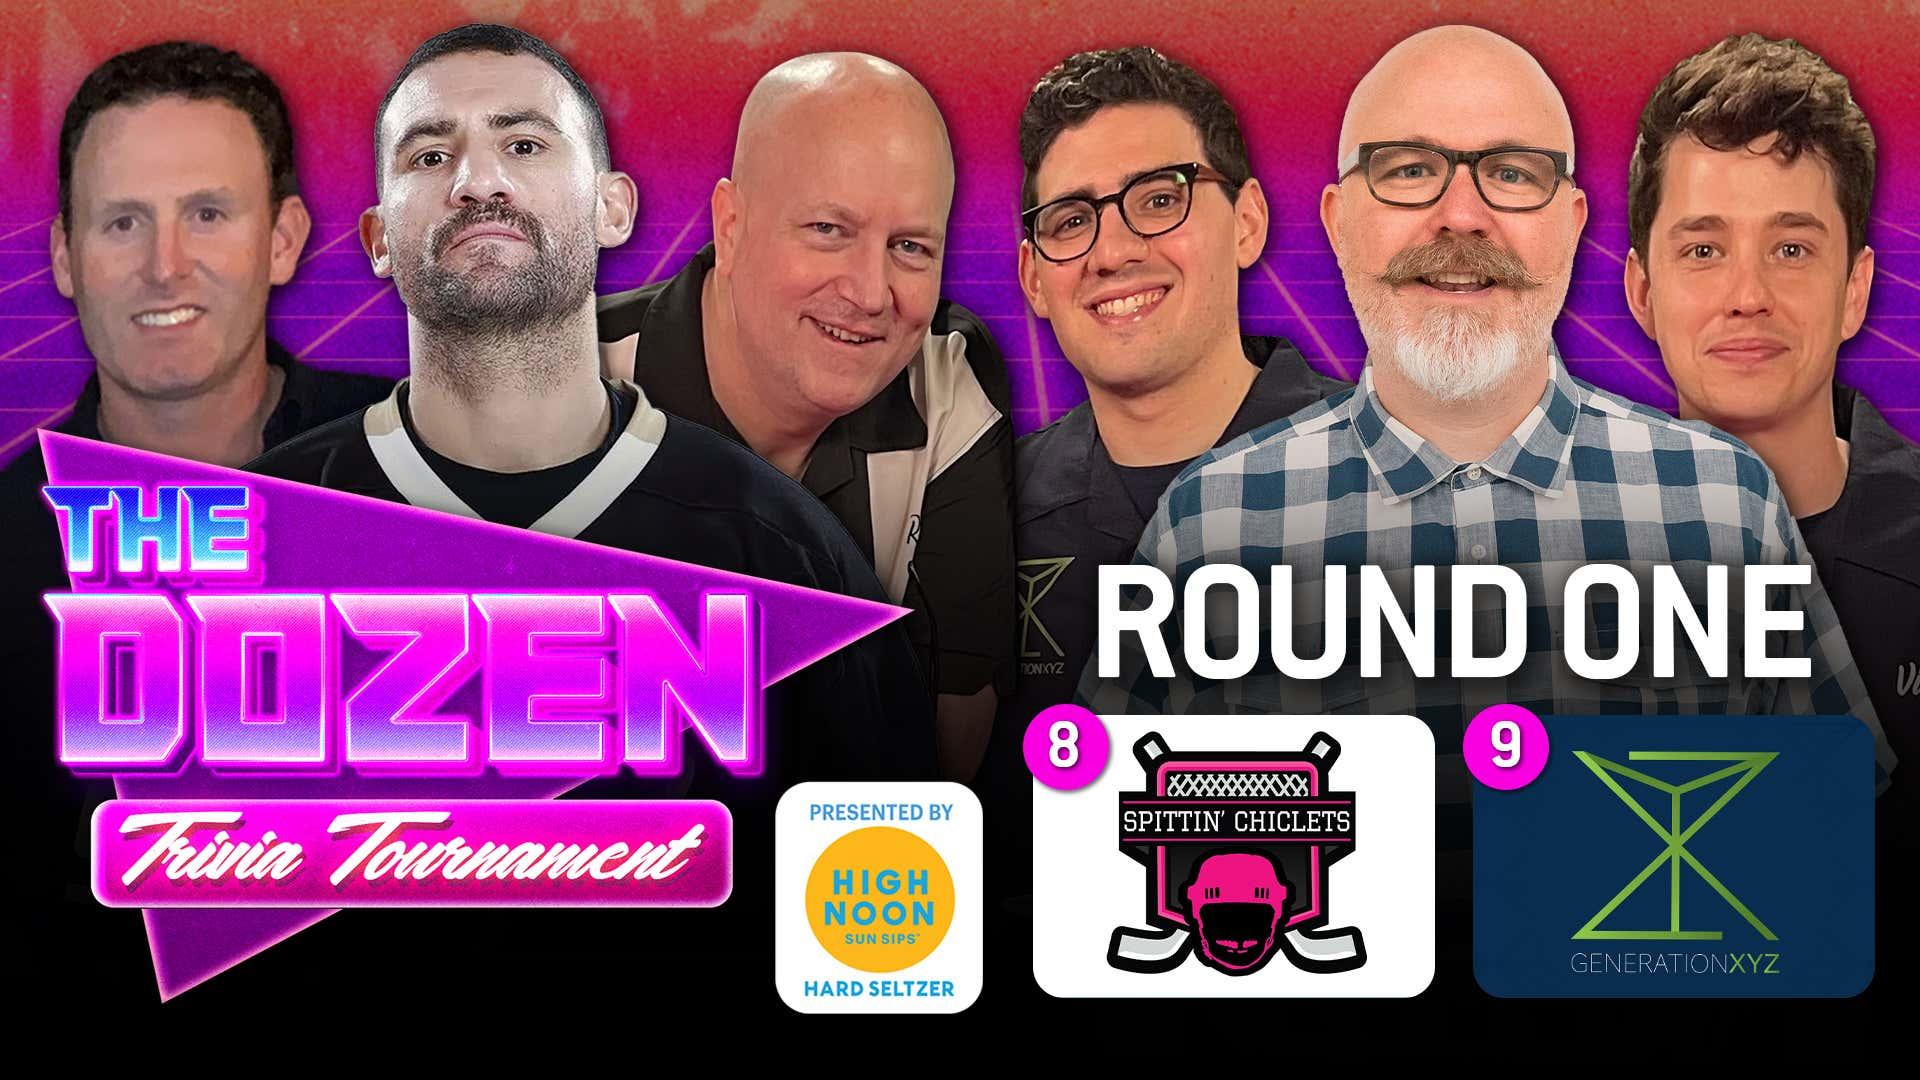 Spittin Chiclets vs. Gen XYZ (The Dozen: Trivia Tournament pres. by High Noon Match 02)